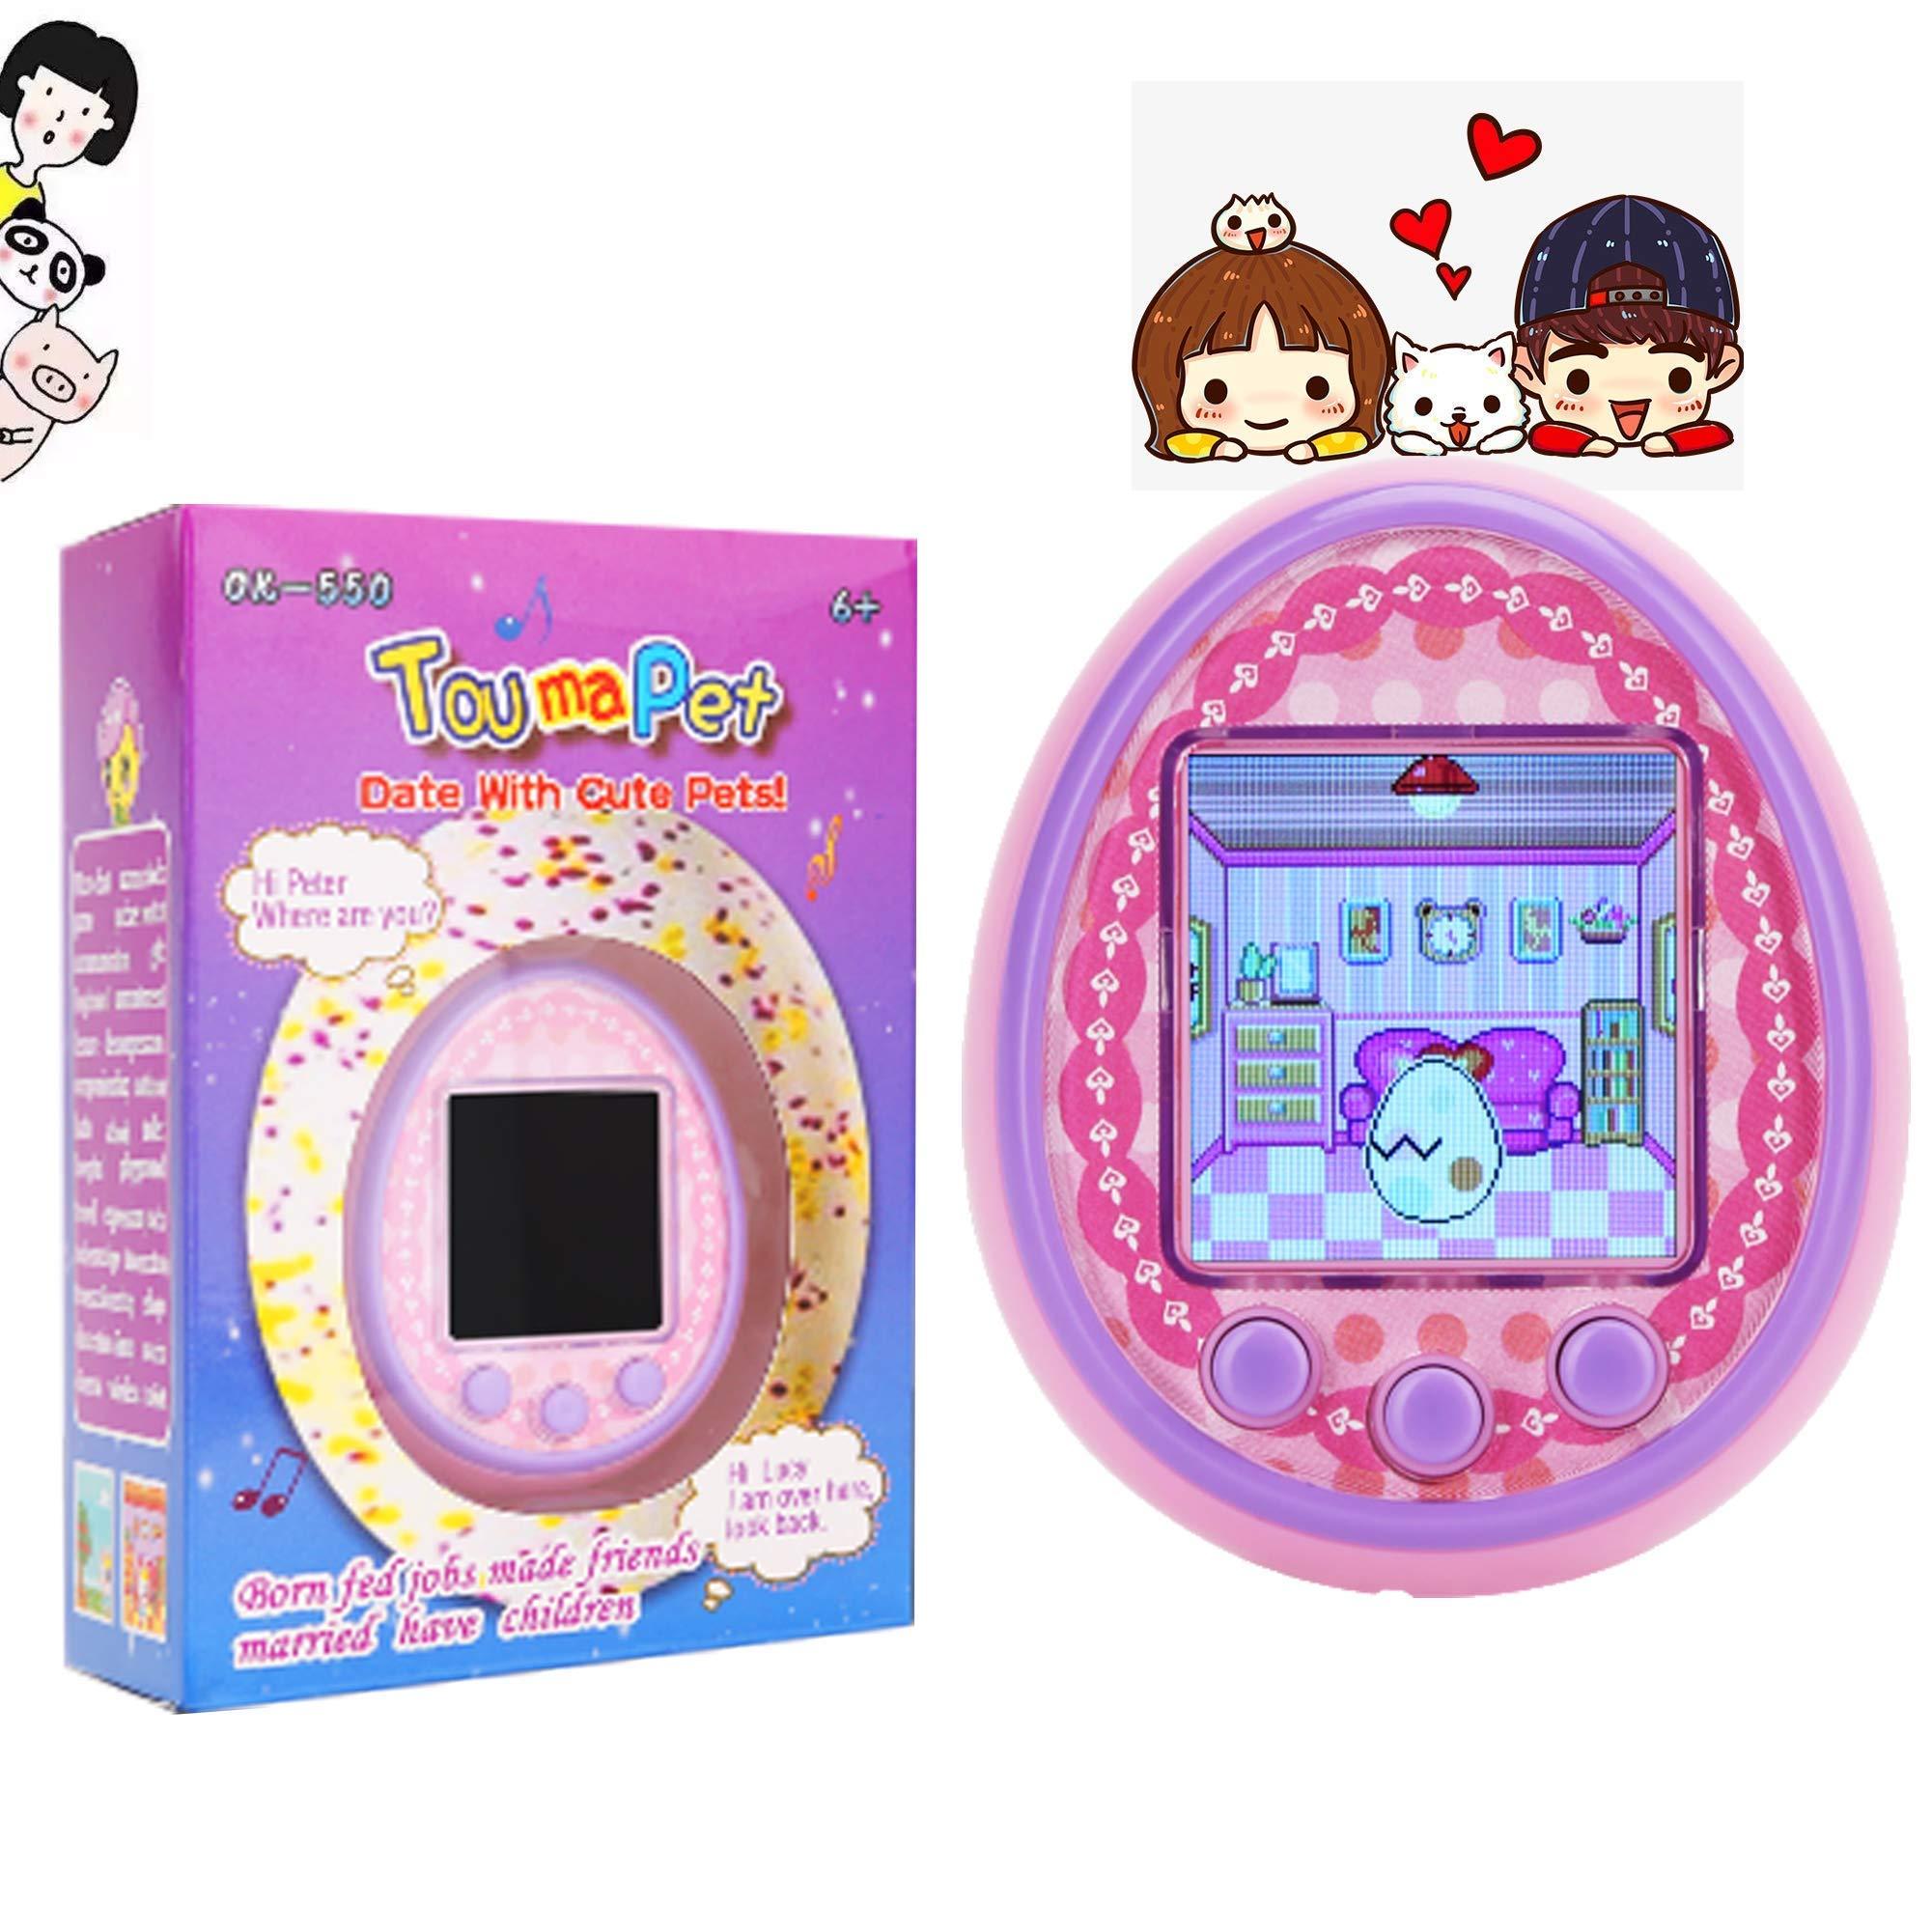 KKLE Virtual Electronic Pets Handheld Pet Game Machine HD Color Screen Kids Electronic Toys Boys Girls Gift. (Pink)